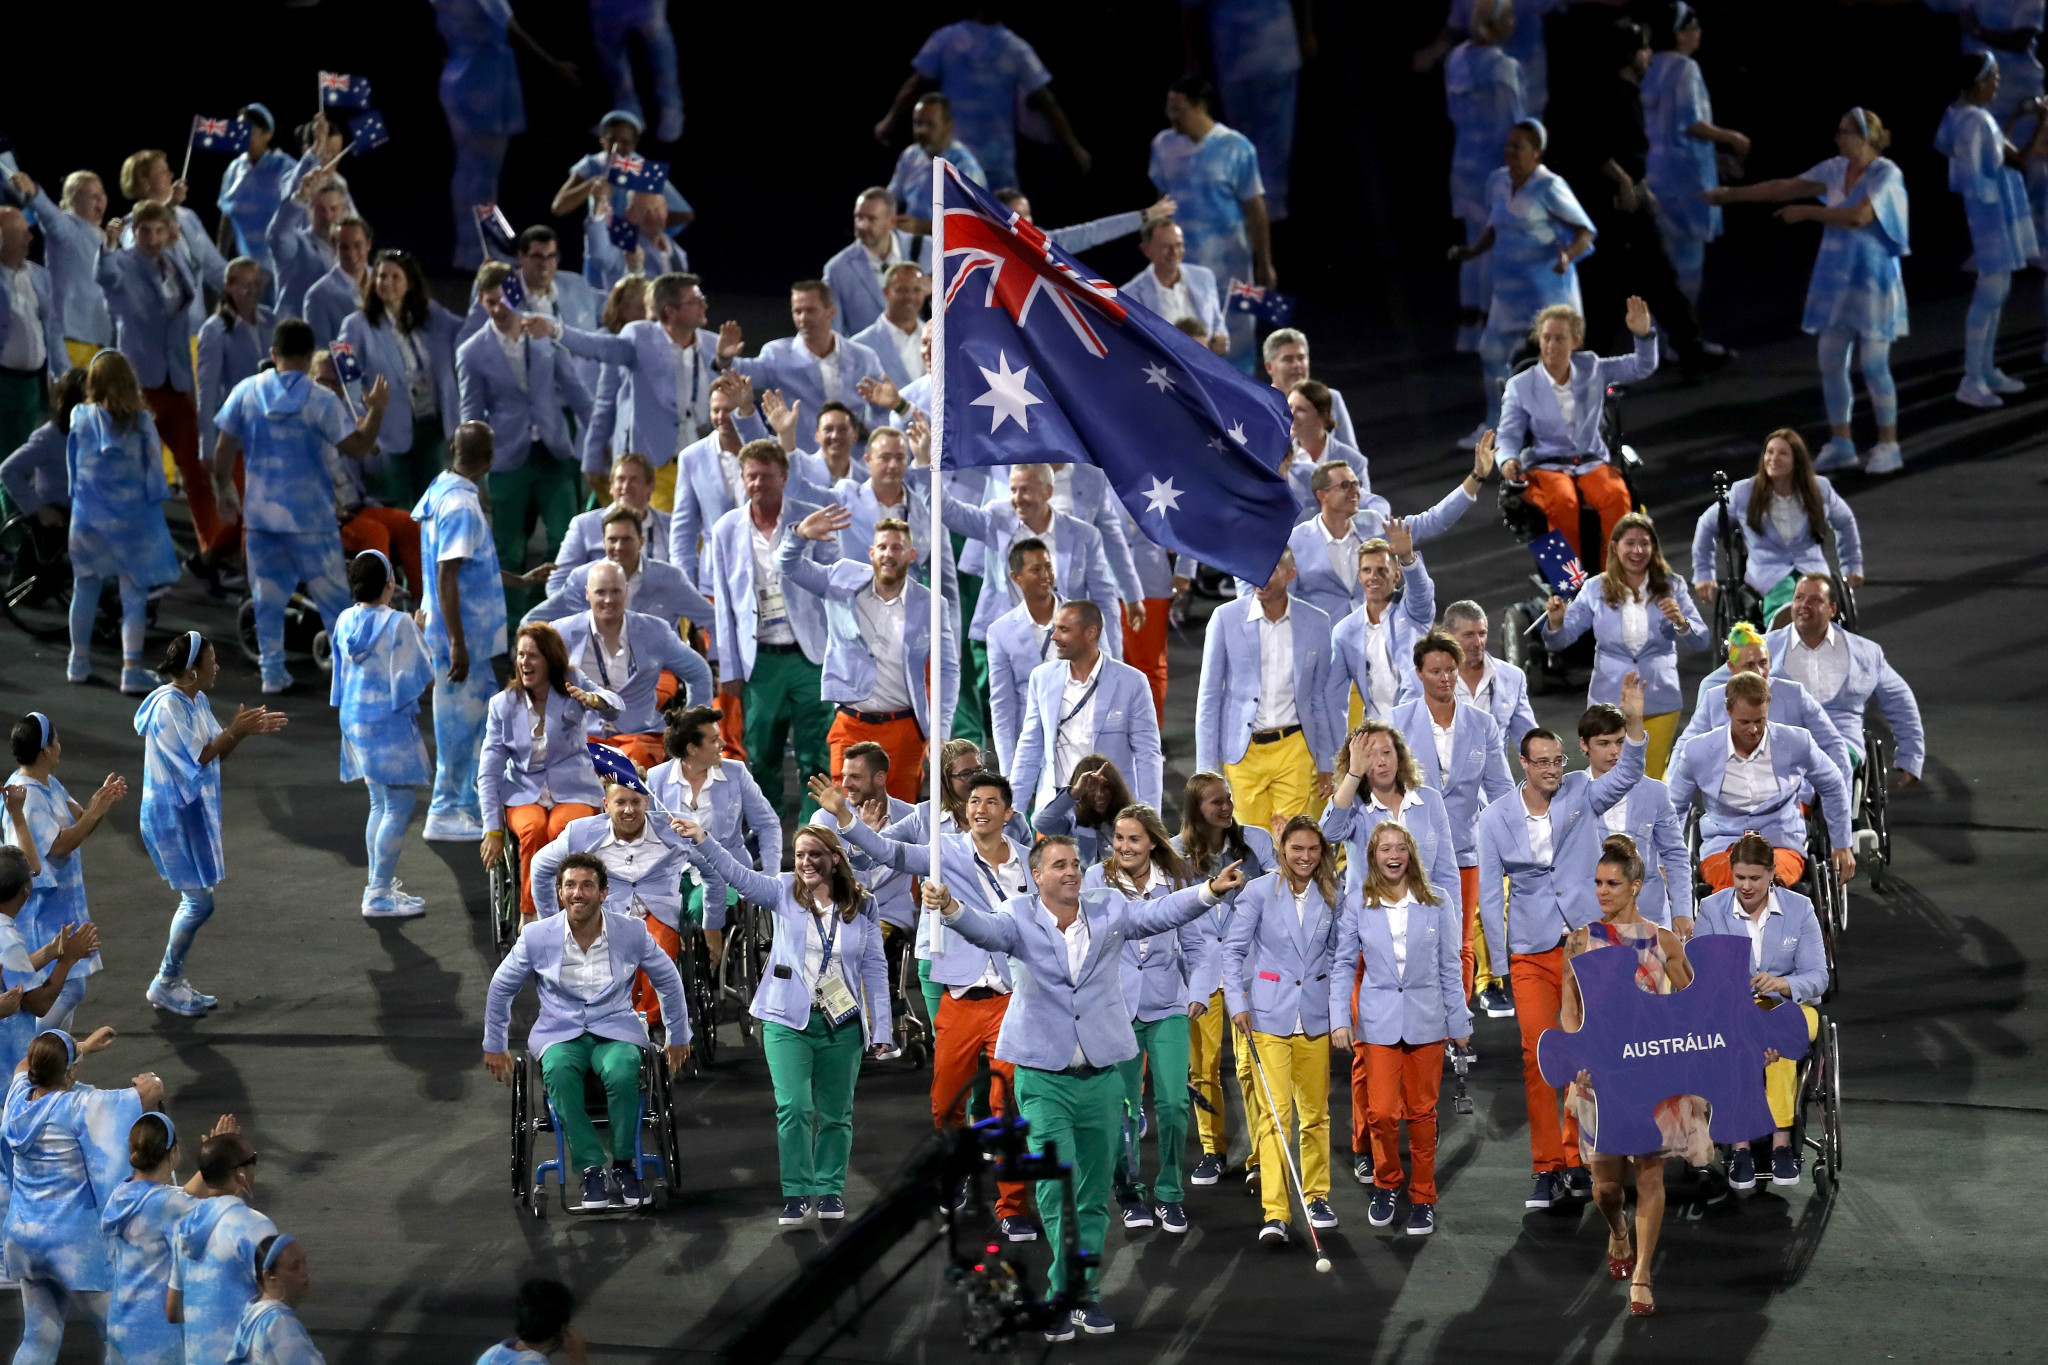 Paralympics Australia adds judo and badminton debutants to Tokyo 2020 team